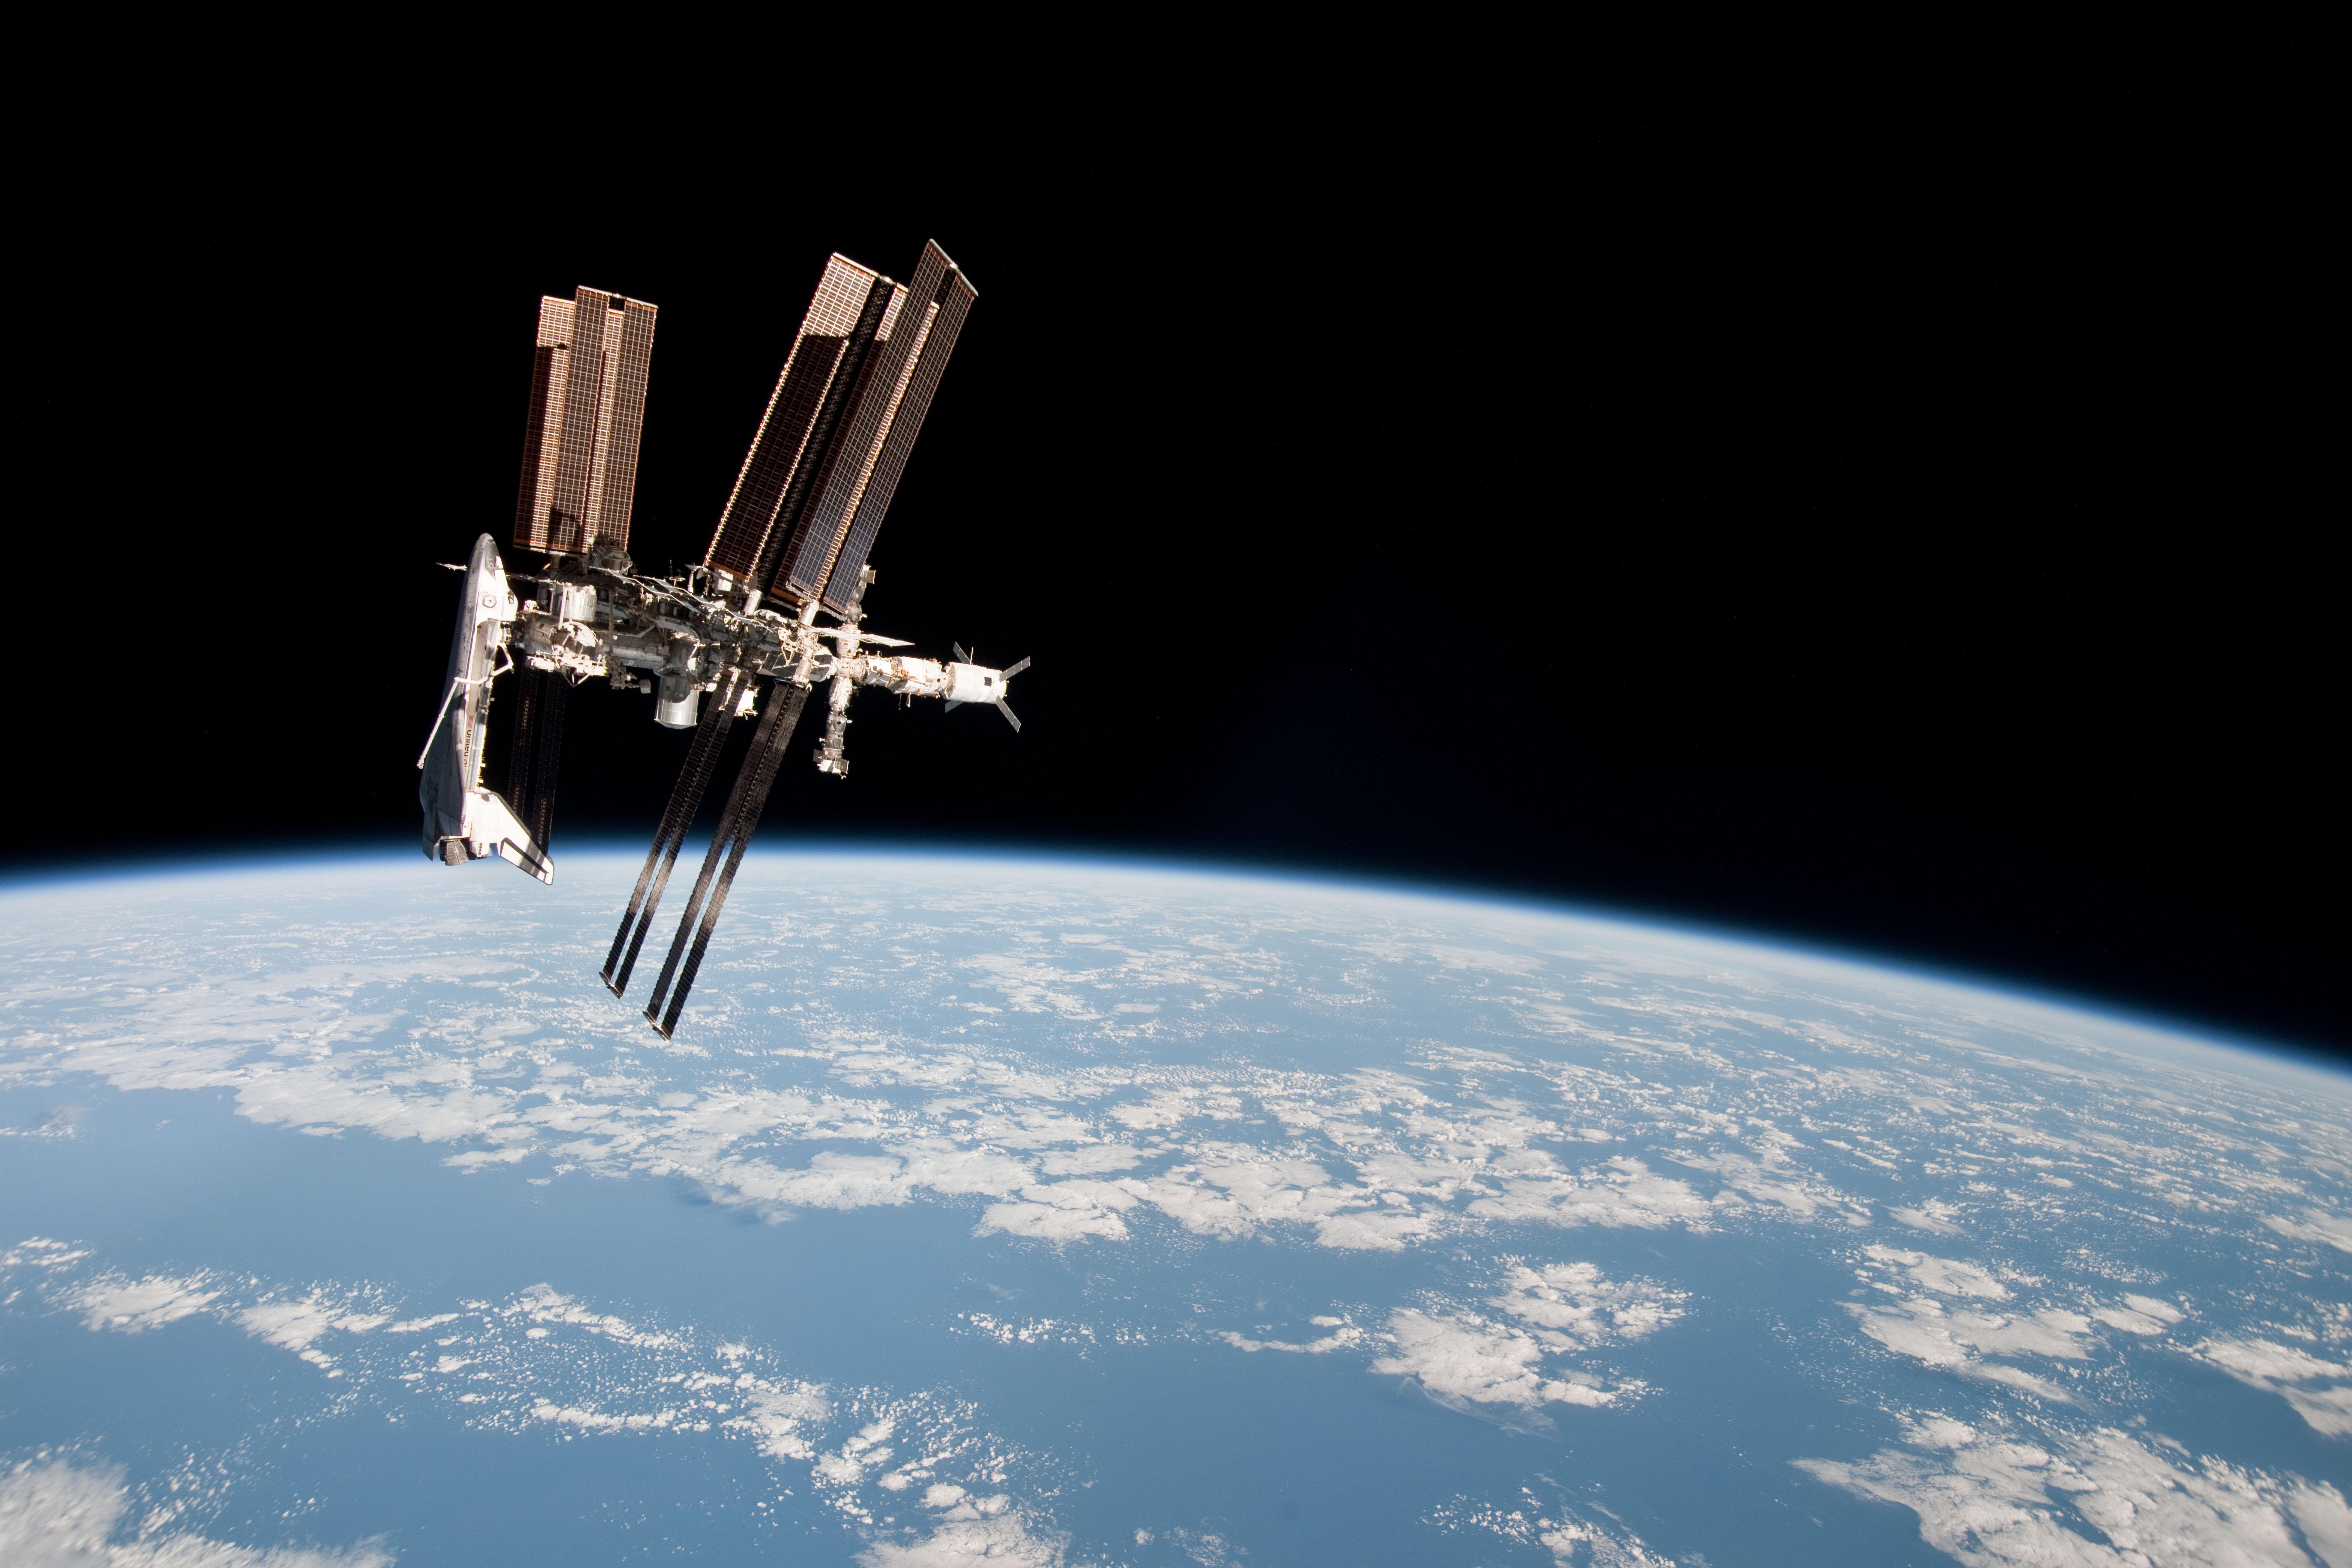 space station nasa - photo #5